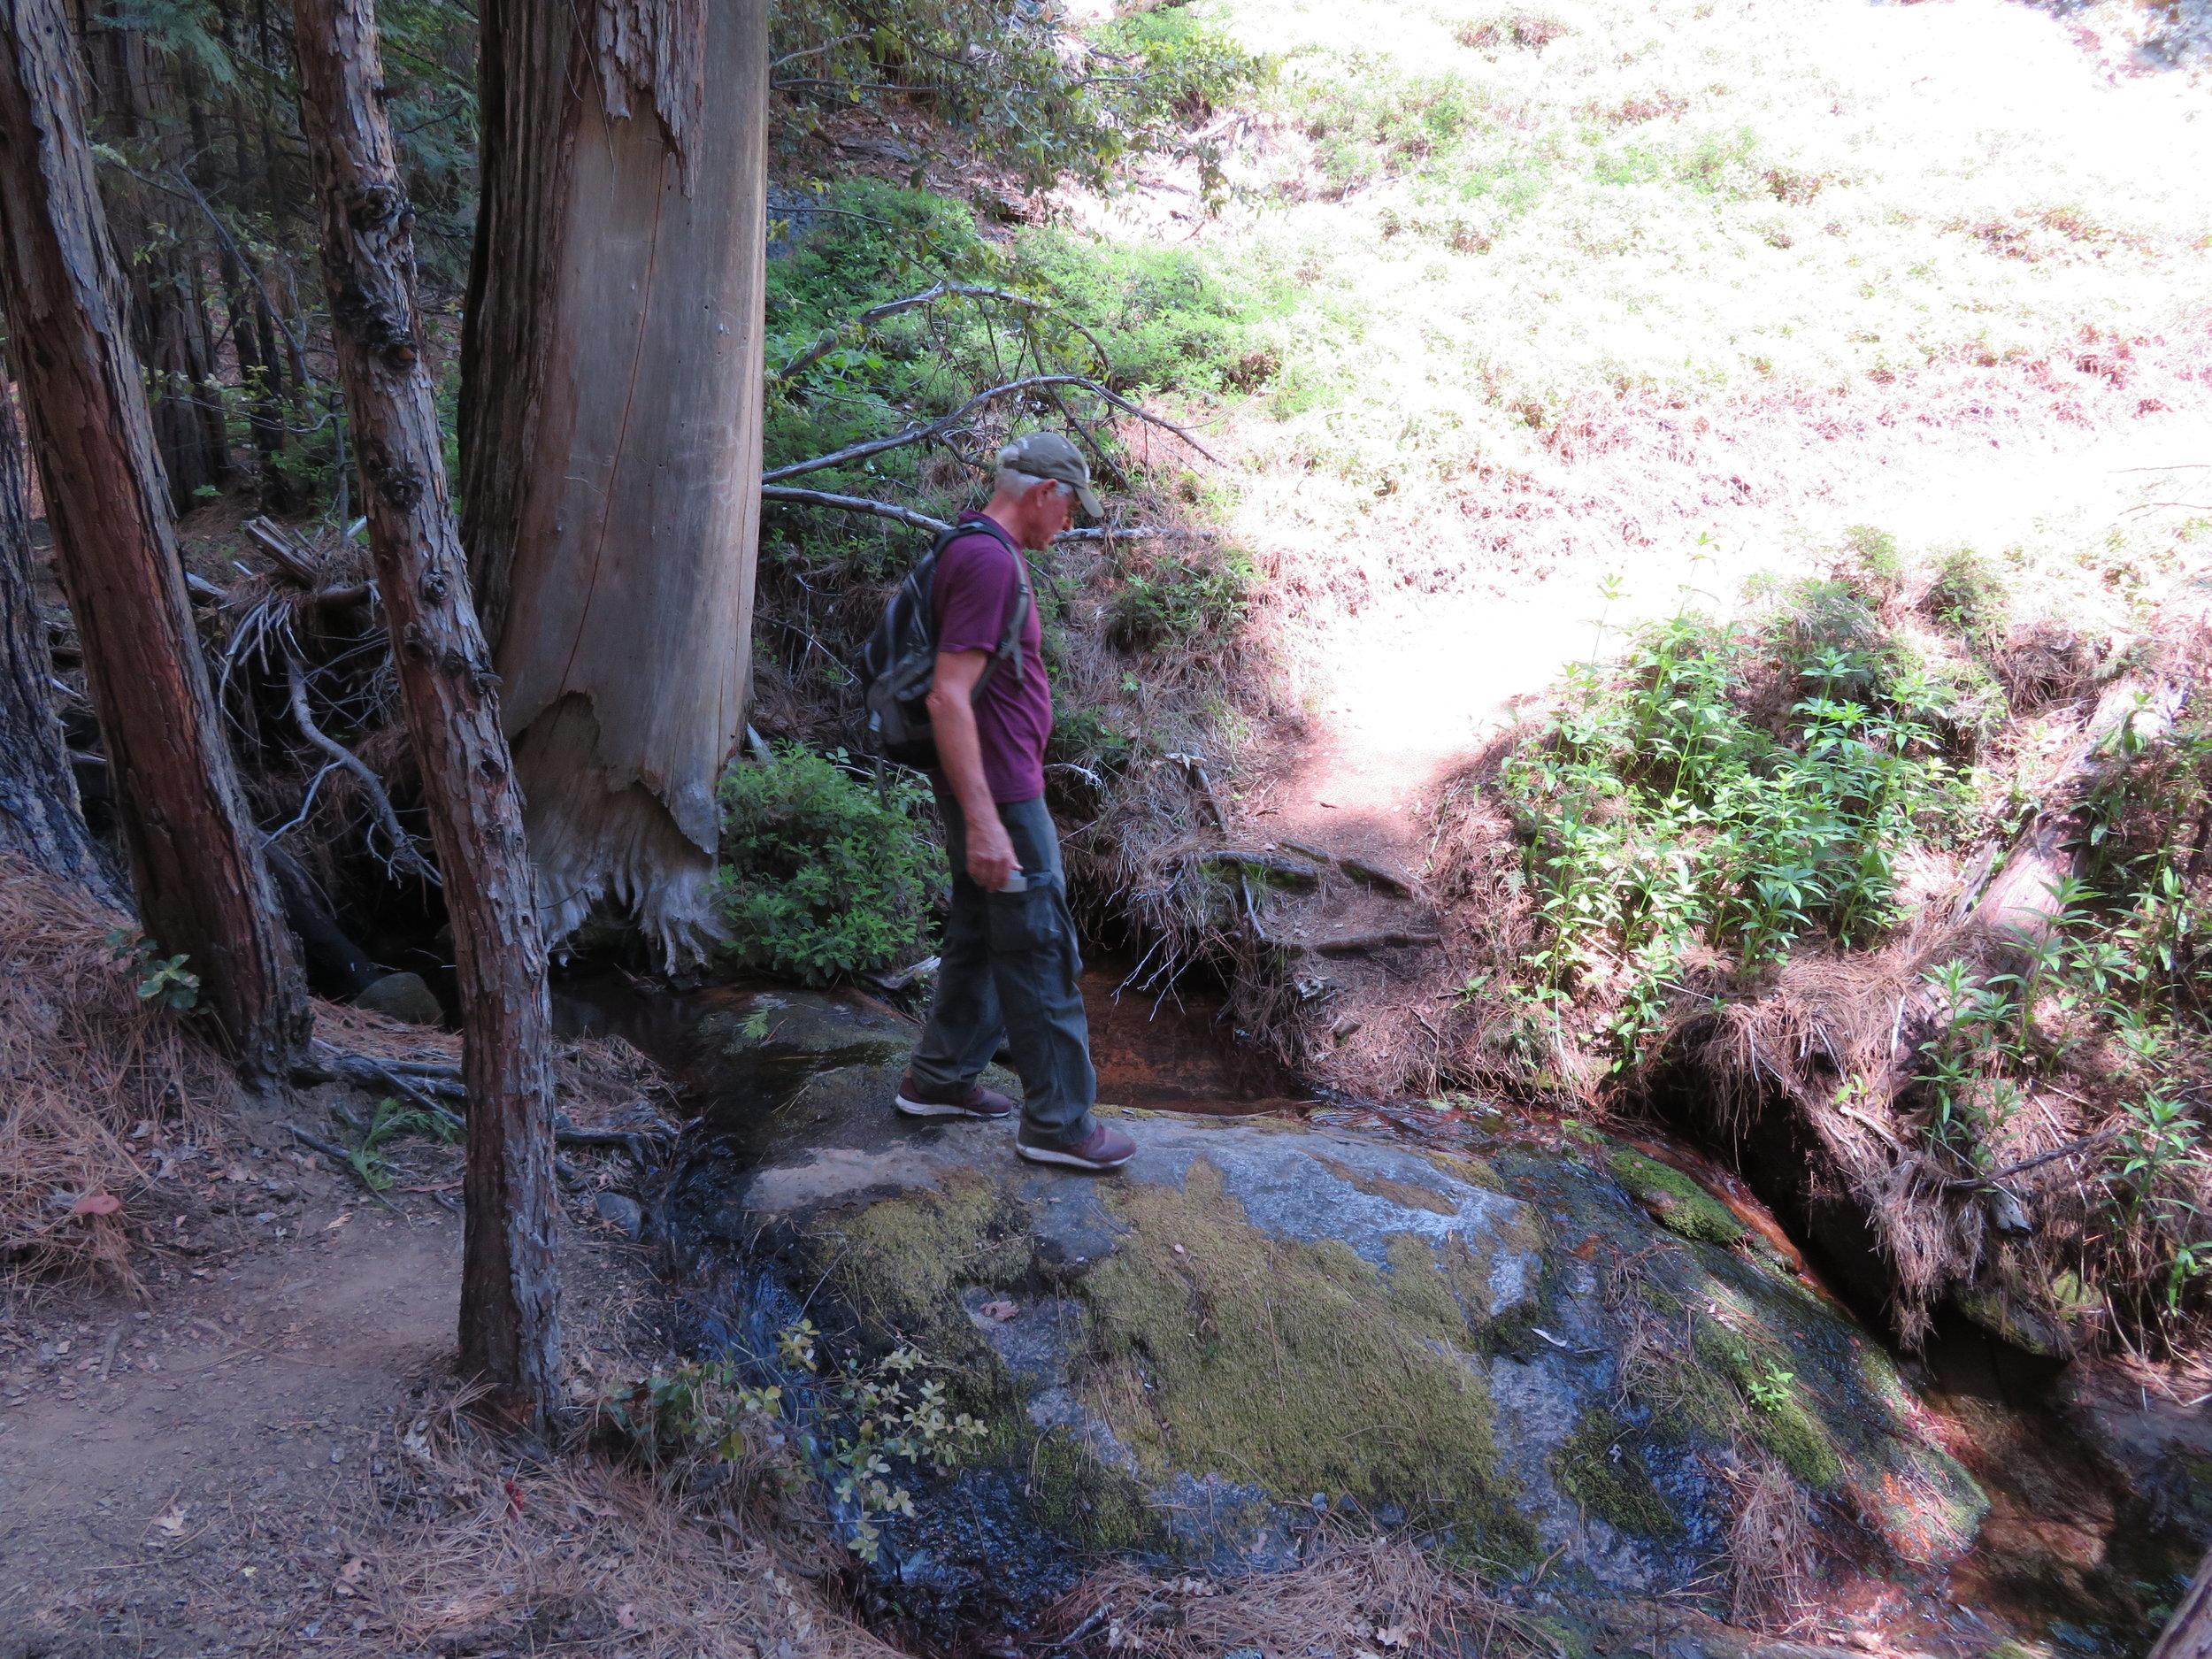 lavabluffs_crossing streams.JPG